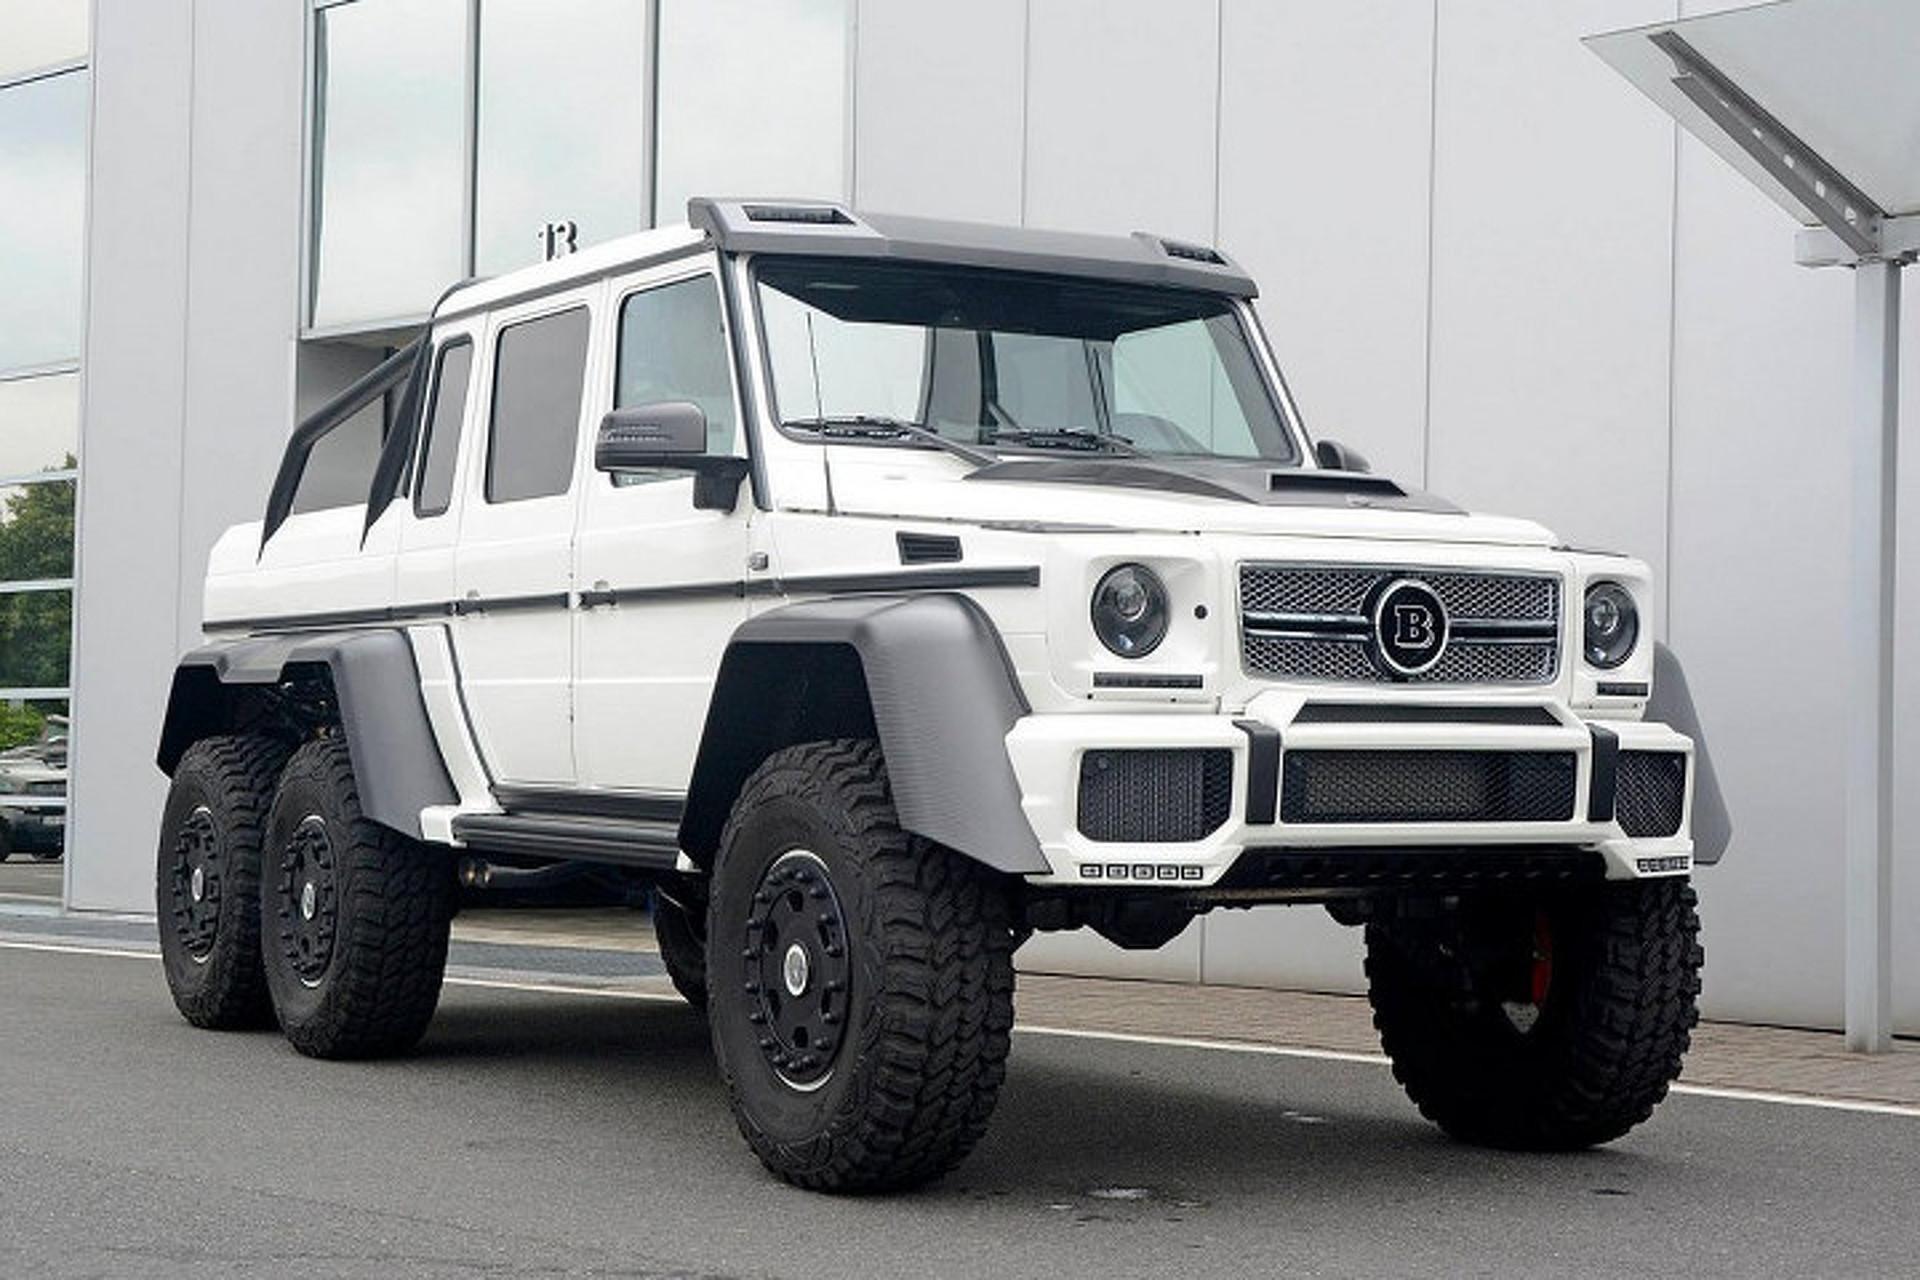 Hd Tune Up Cars Wallpaper Dan Bilzerian Now Owns A Mercedes 6x6 Of Course